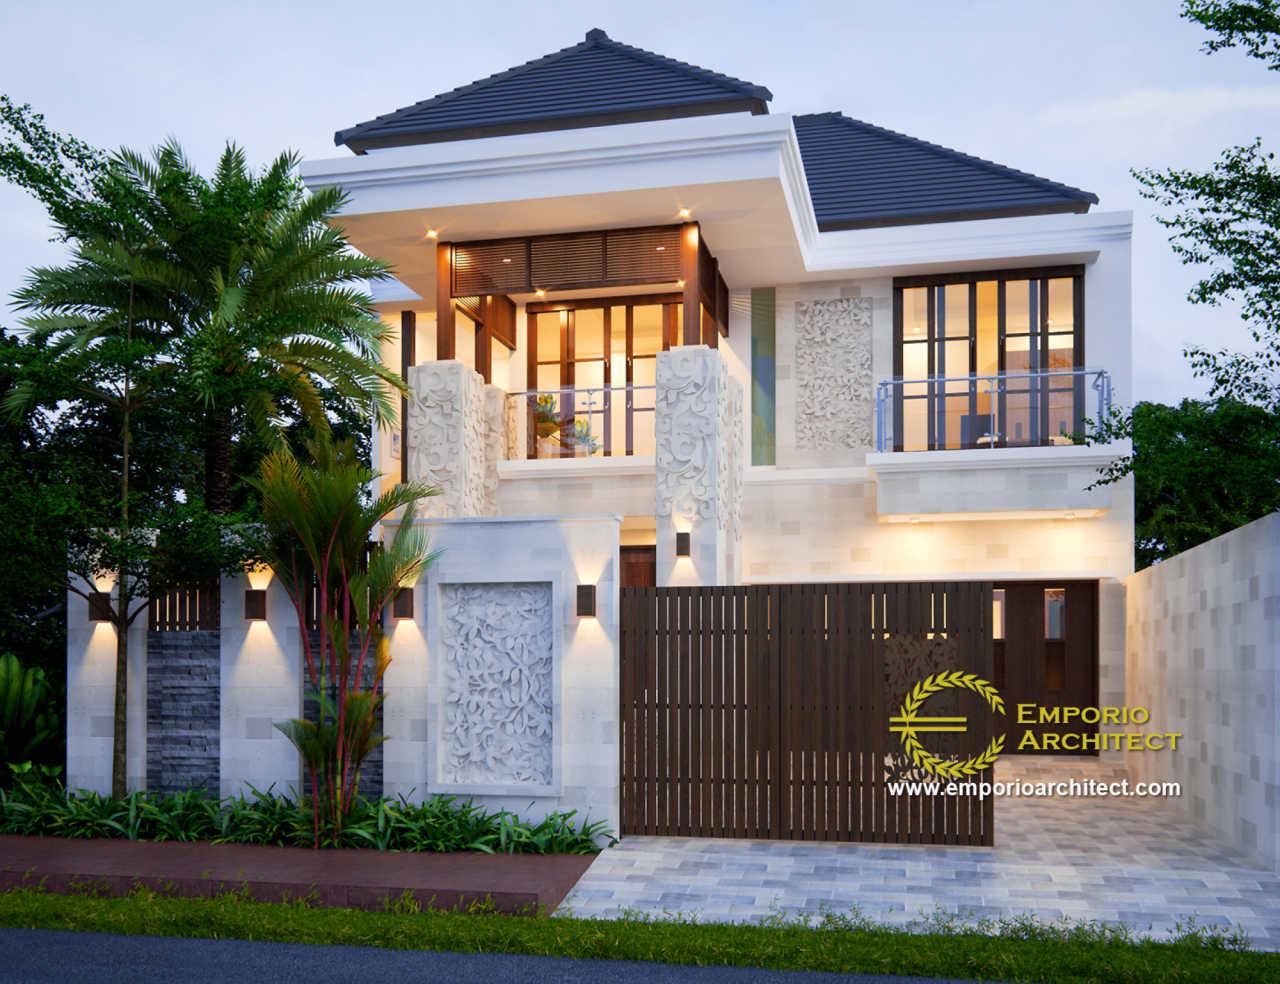 Inspirasi Desain Rumah Bergaya Villa Bali Tropis di Semarang, Jawa Tengah